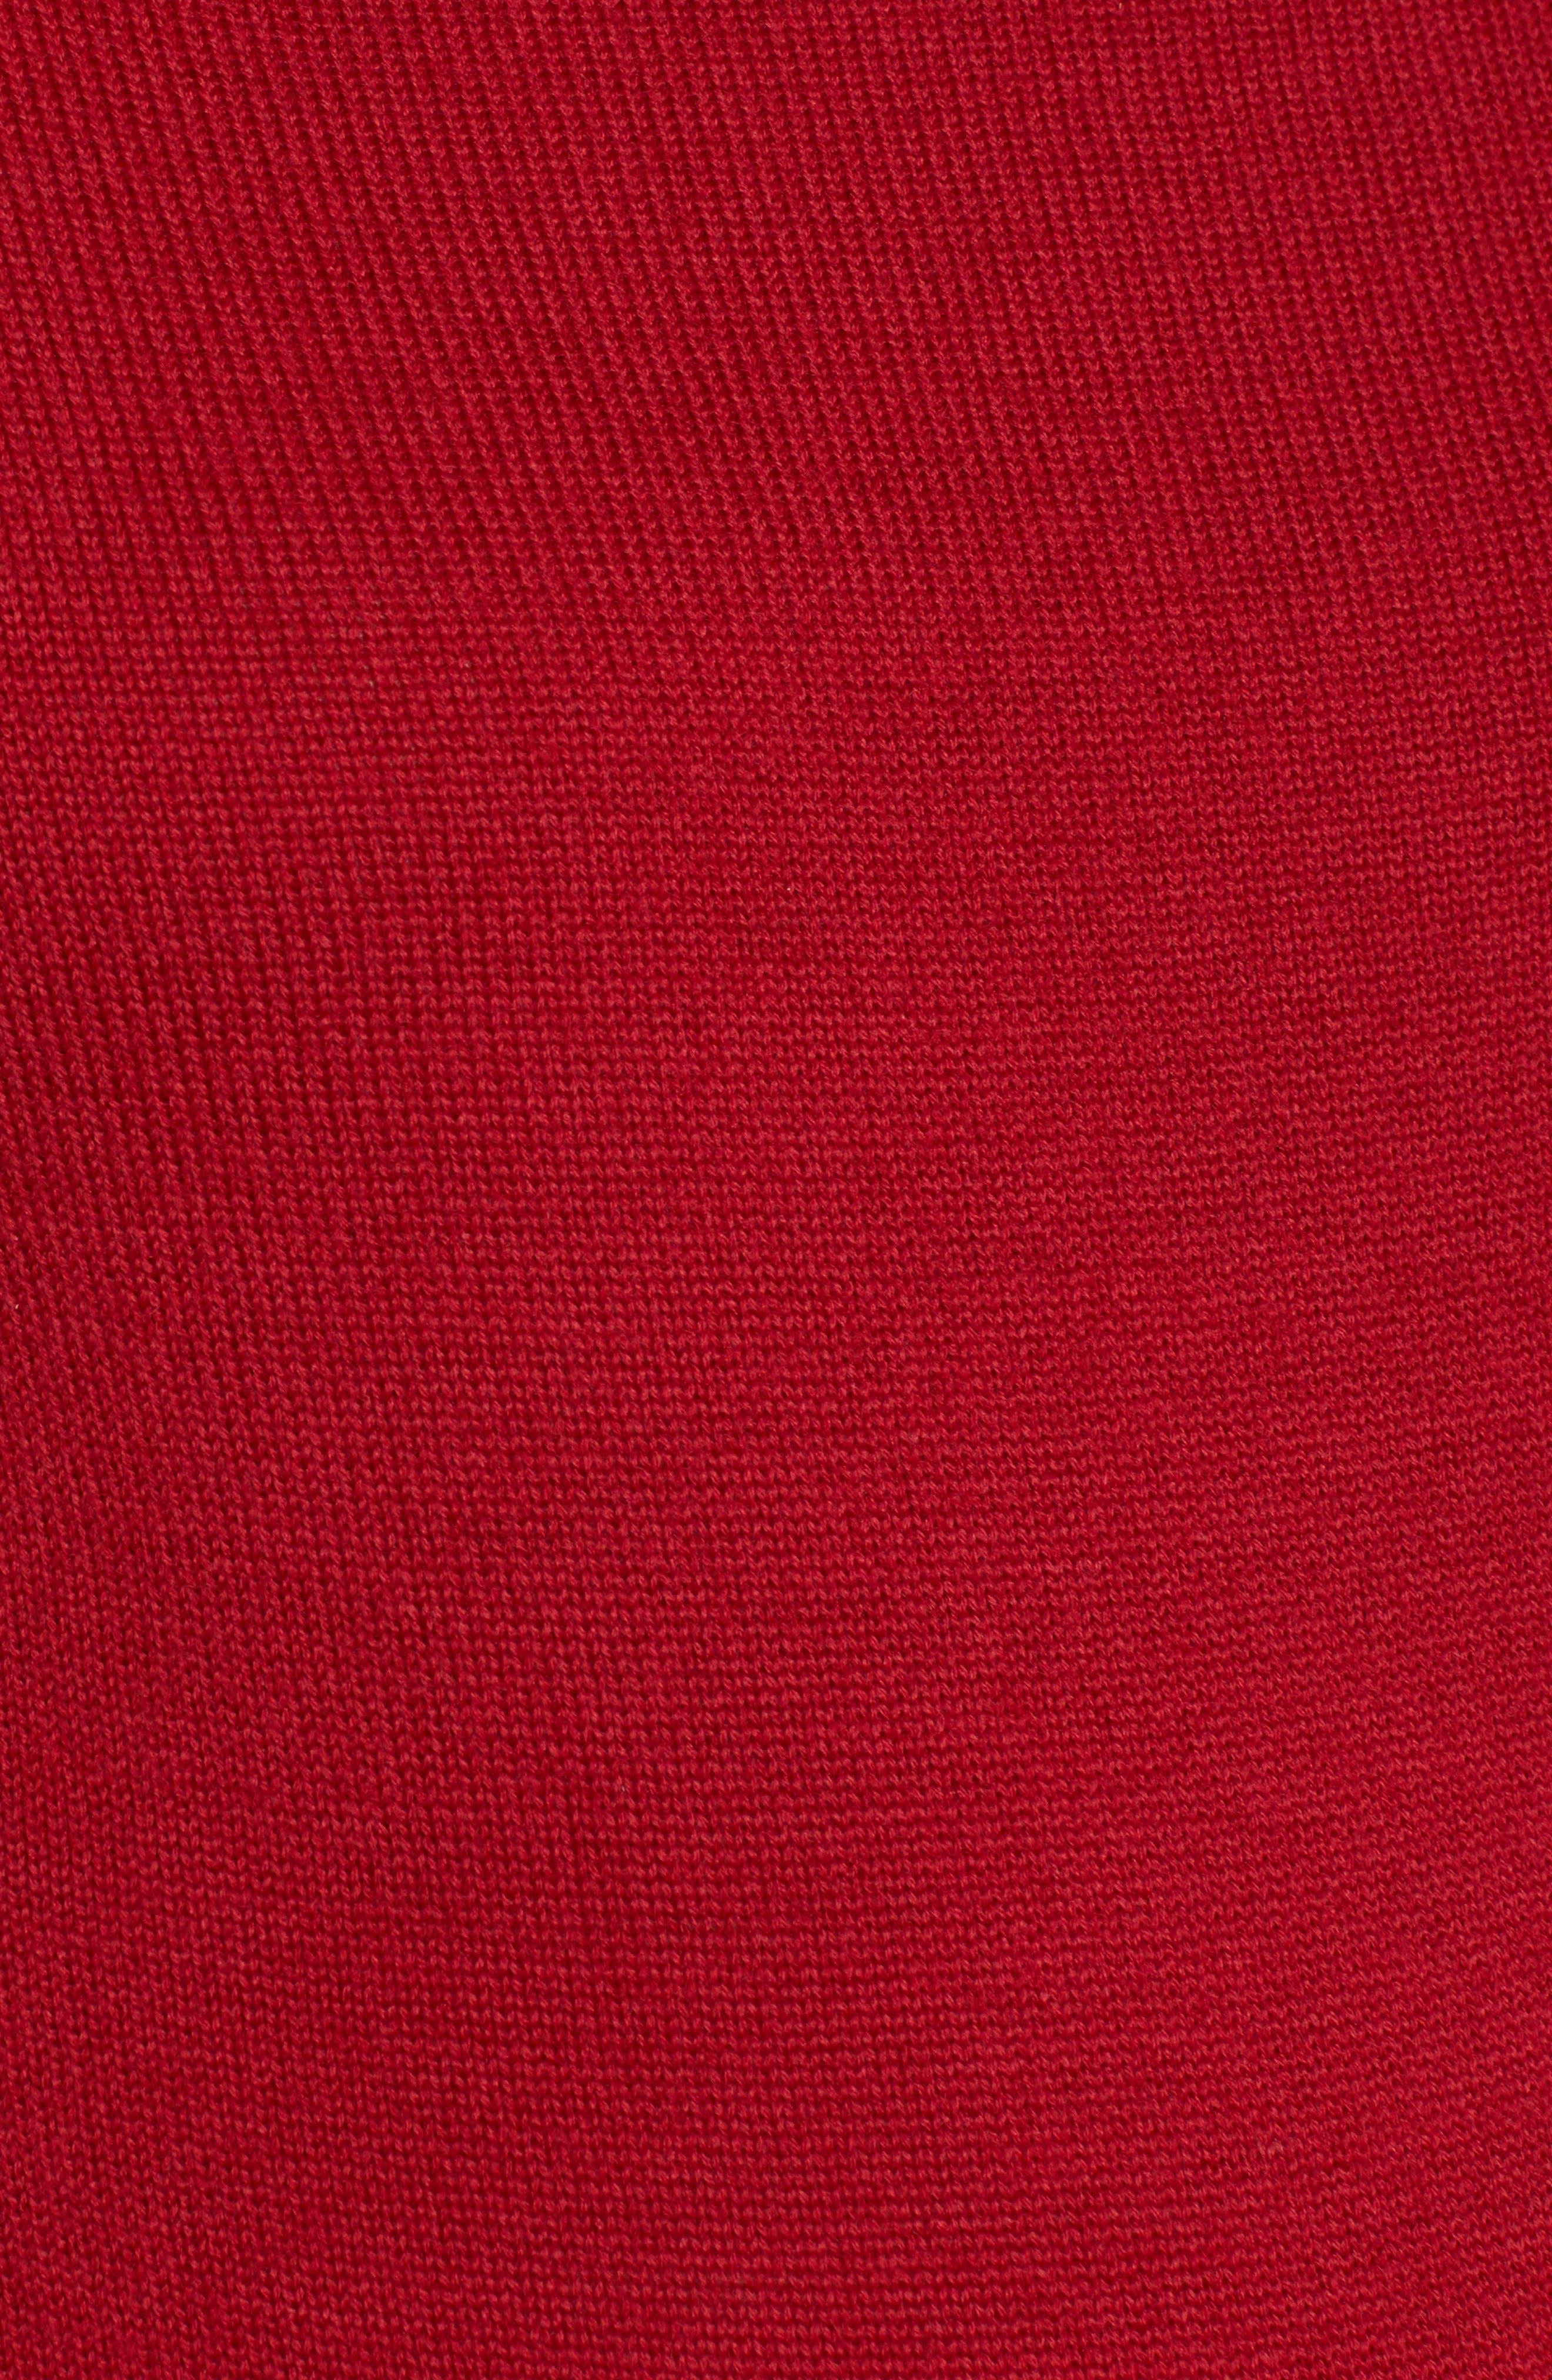 Tessa Turtleneck Wool Maternity Sweater,                             Alternate thumbnail 5, color,                             CARDAMOM RED